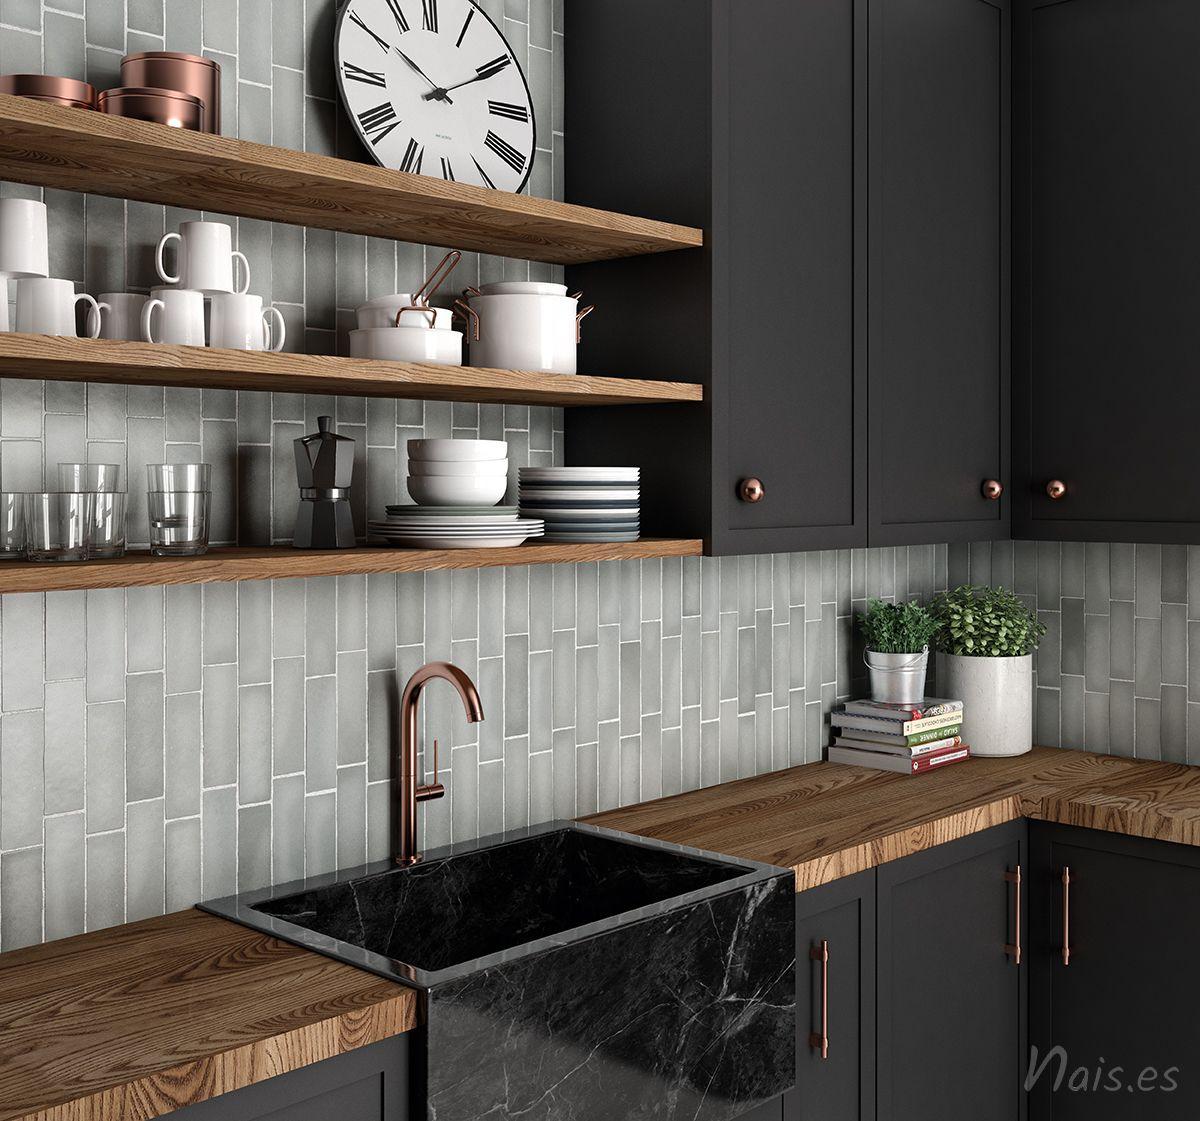 Magma Grey Stone 6 5x20 Cm Azulejos Ceramica Tile Ceramict Diseno De Interior Para Apartamento Muebles De Cocina Modernos Azulejos Para Cocina Modernos